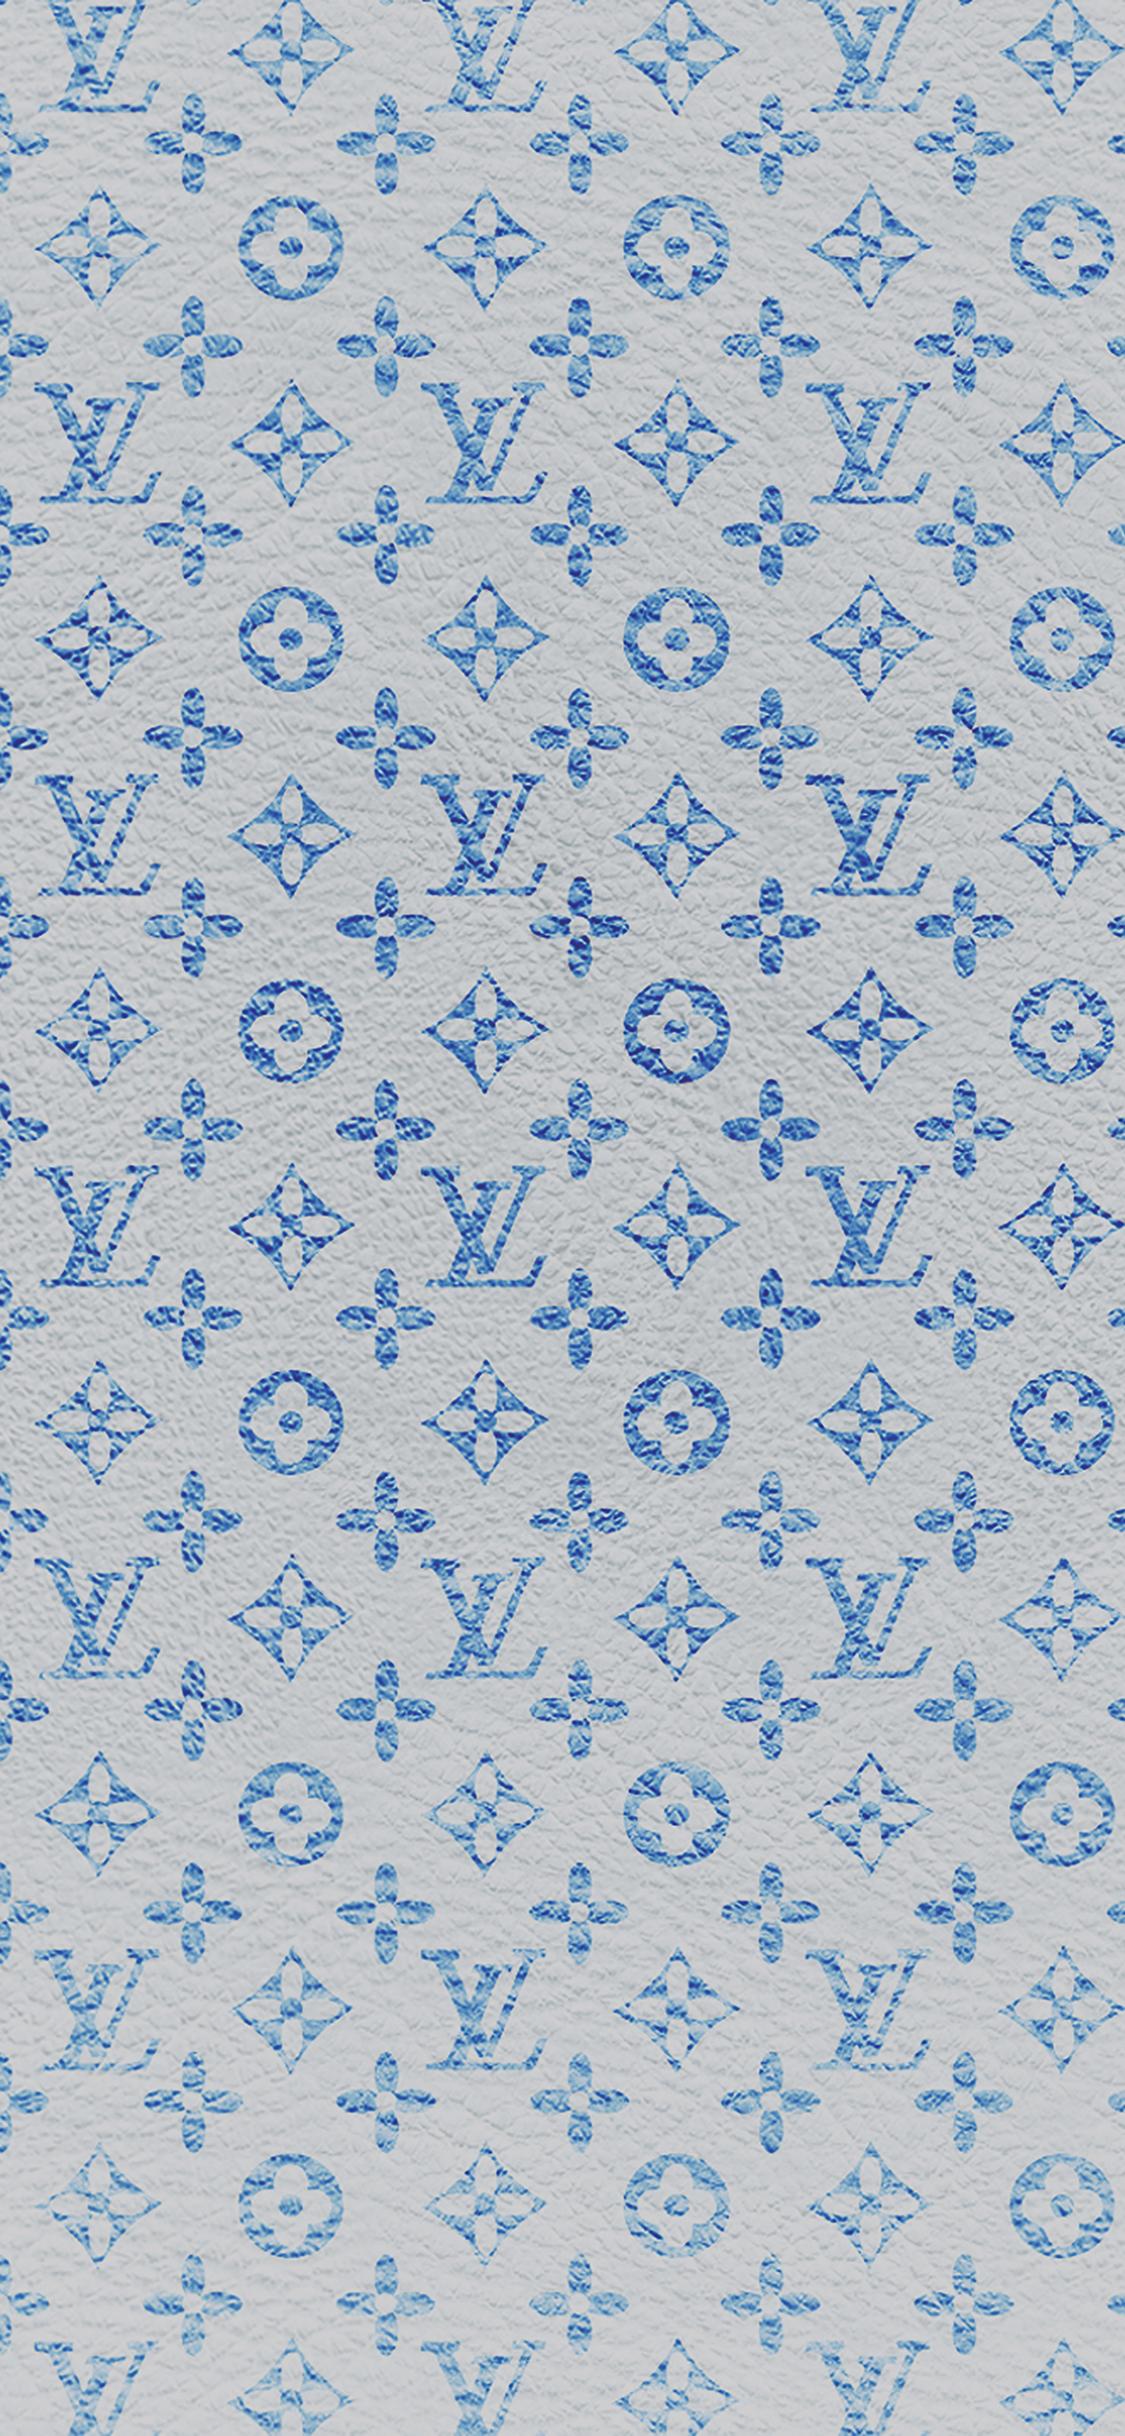 Louis Vuitton Blue Pattern Art Iphone X Wallpapers Free Download